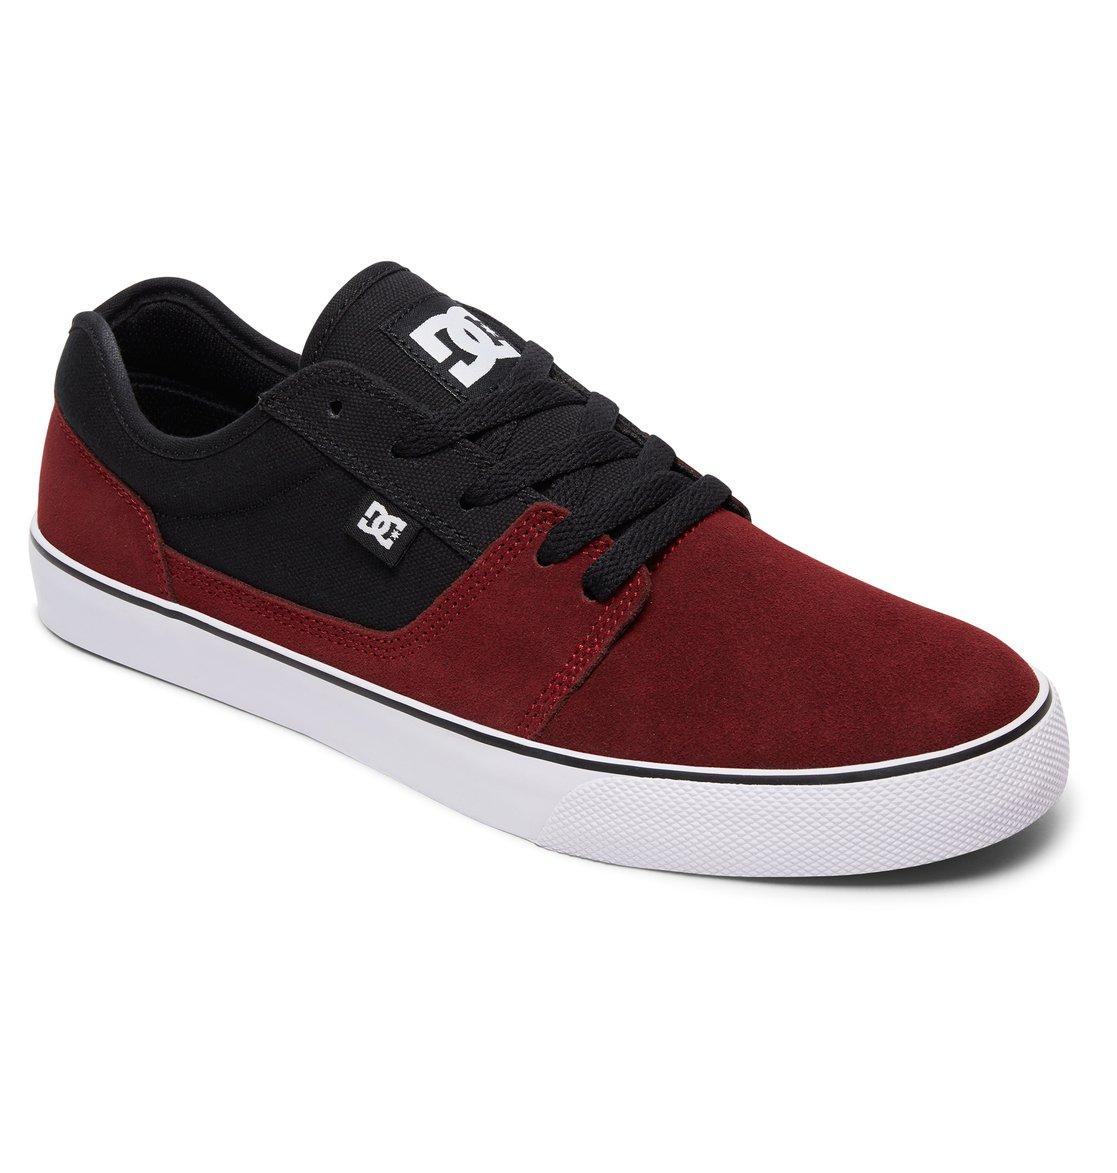 DC Shoes Wes Kremer - Zapatillas para Hombre ADYS300315, negro/gris/blanco, 47 EU